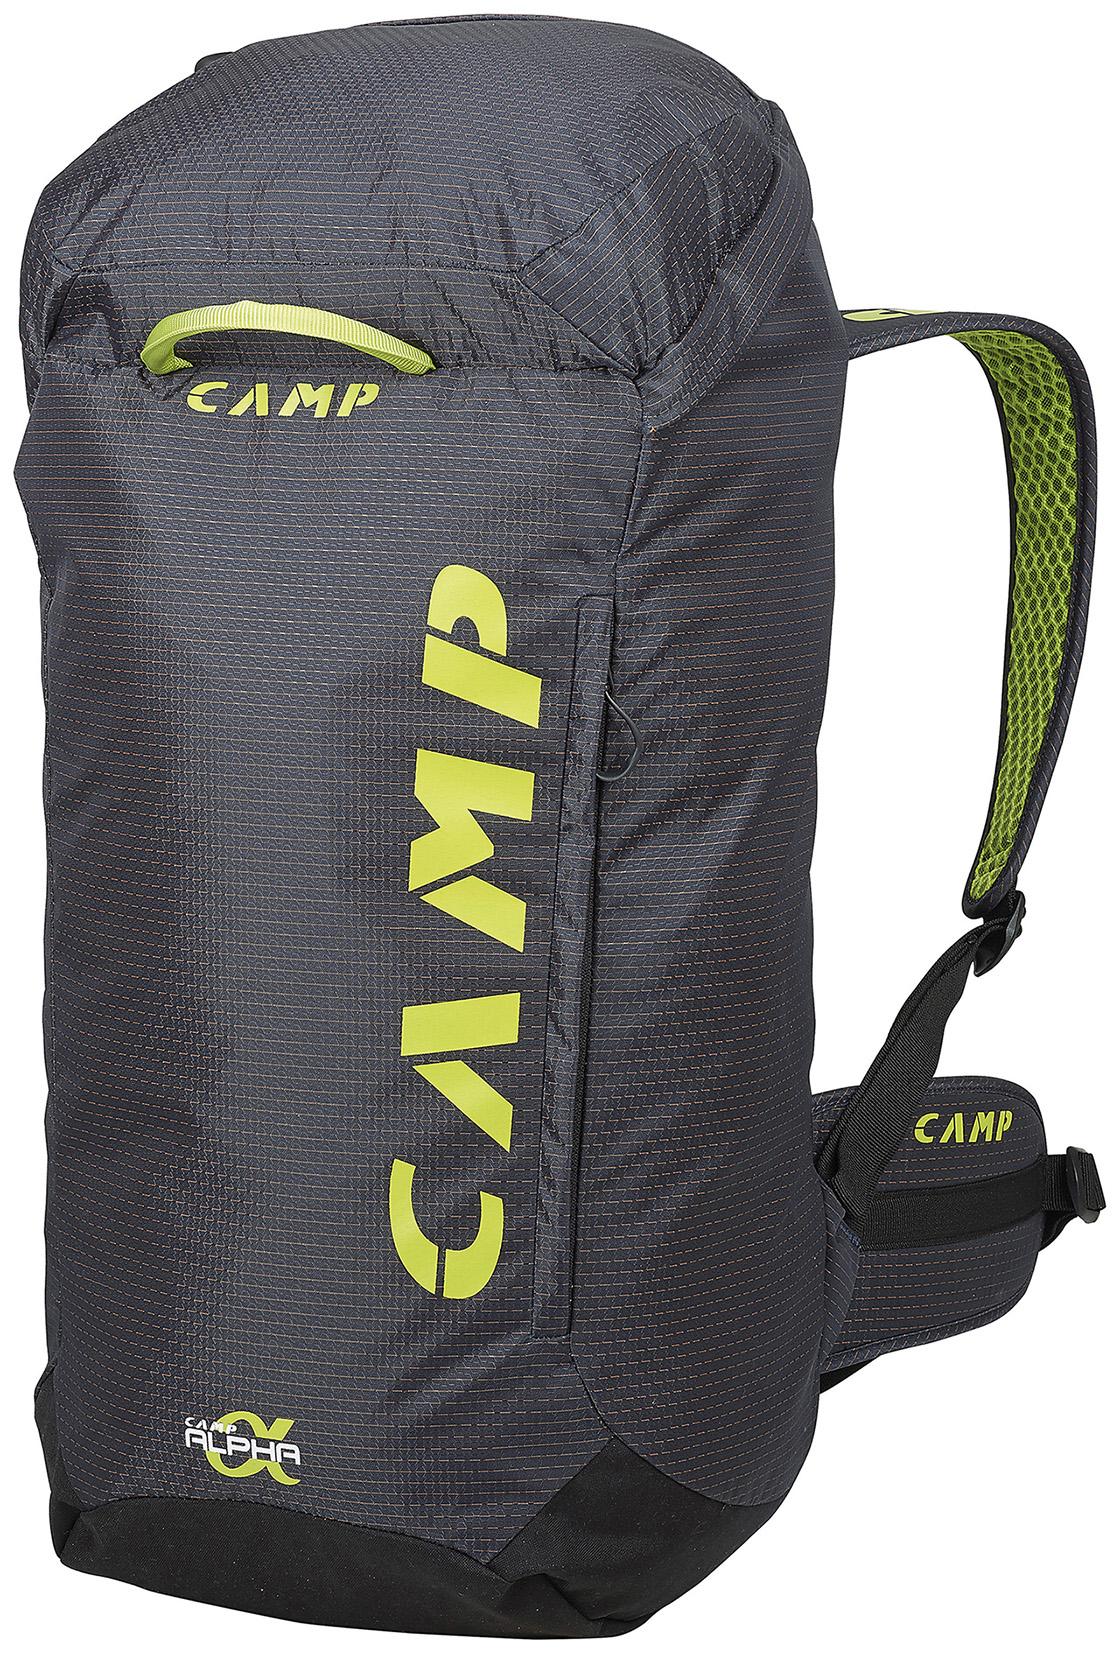 C.A.M.P. ROX ALPHA Climbing Pack by C.A.M.P.